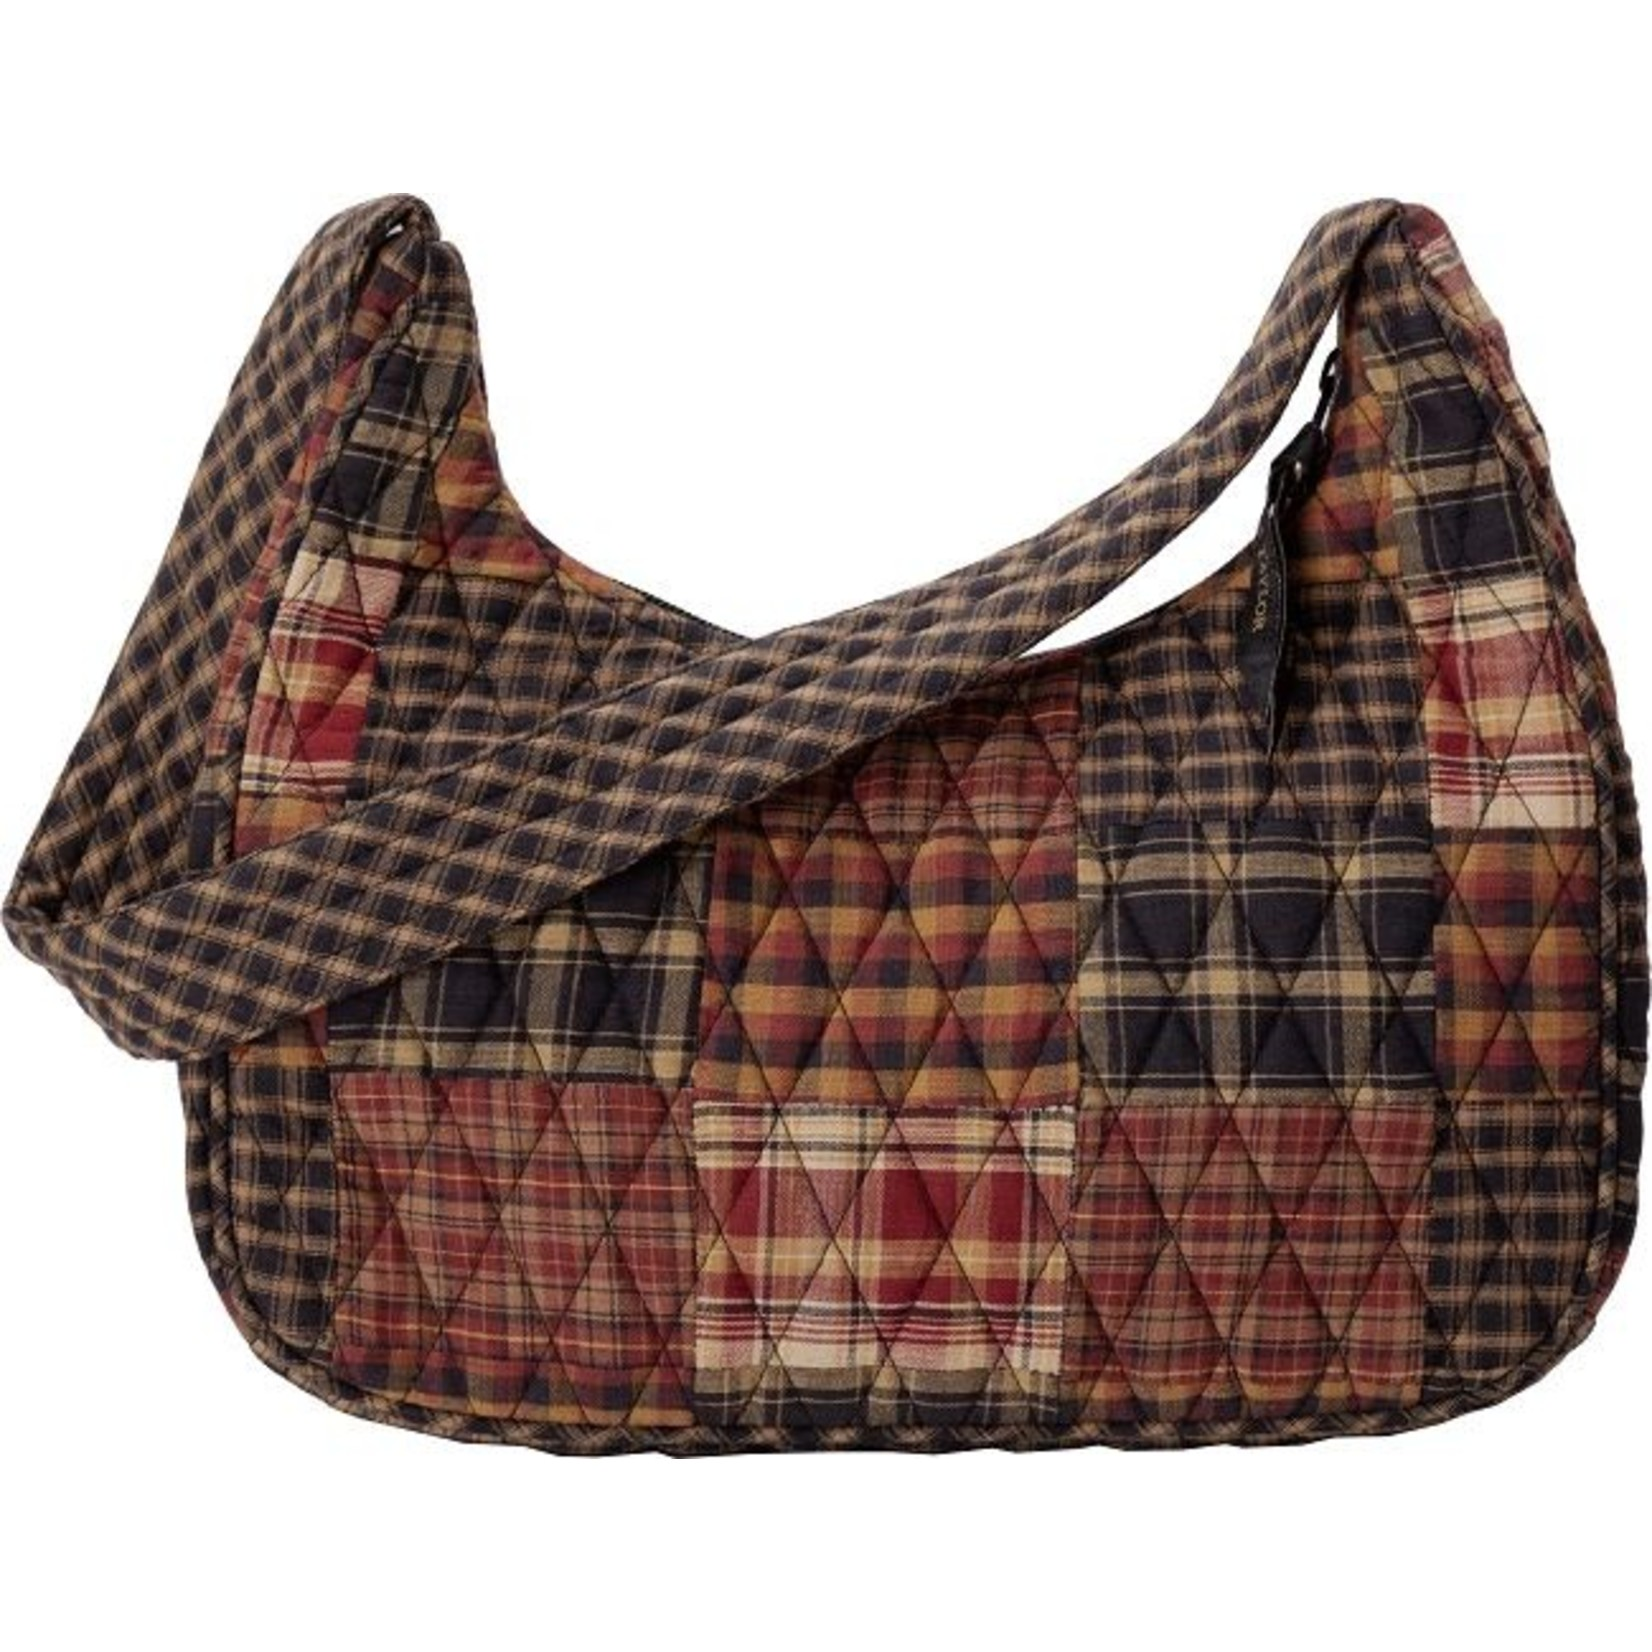 Bella Taylor Beckham - Blakely handbag